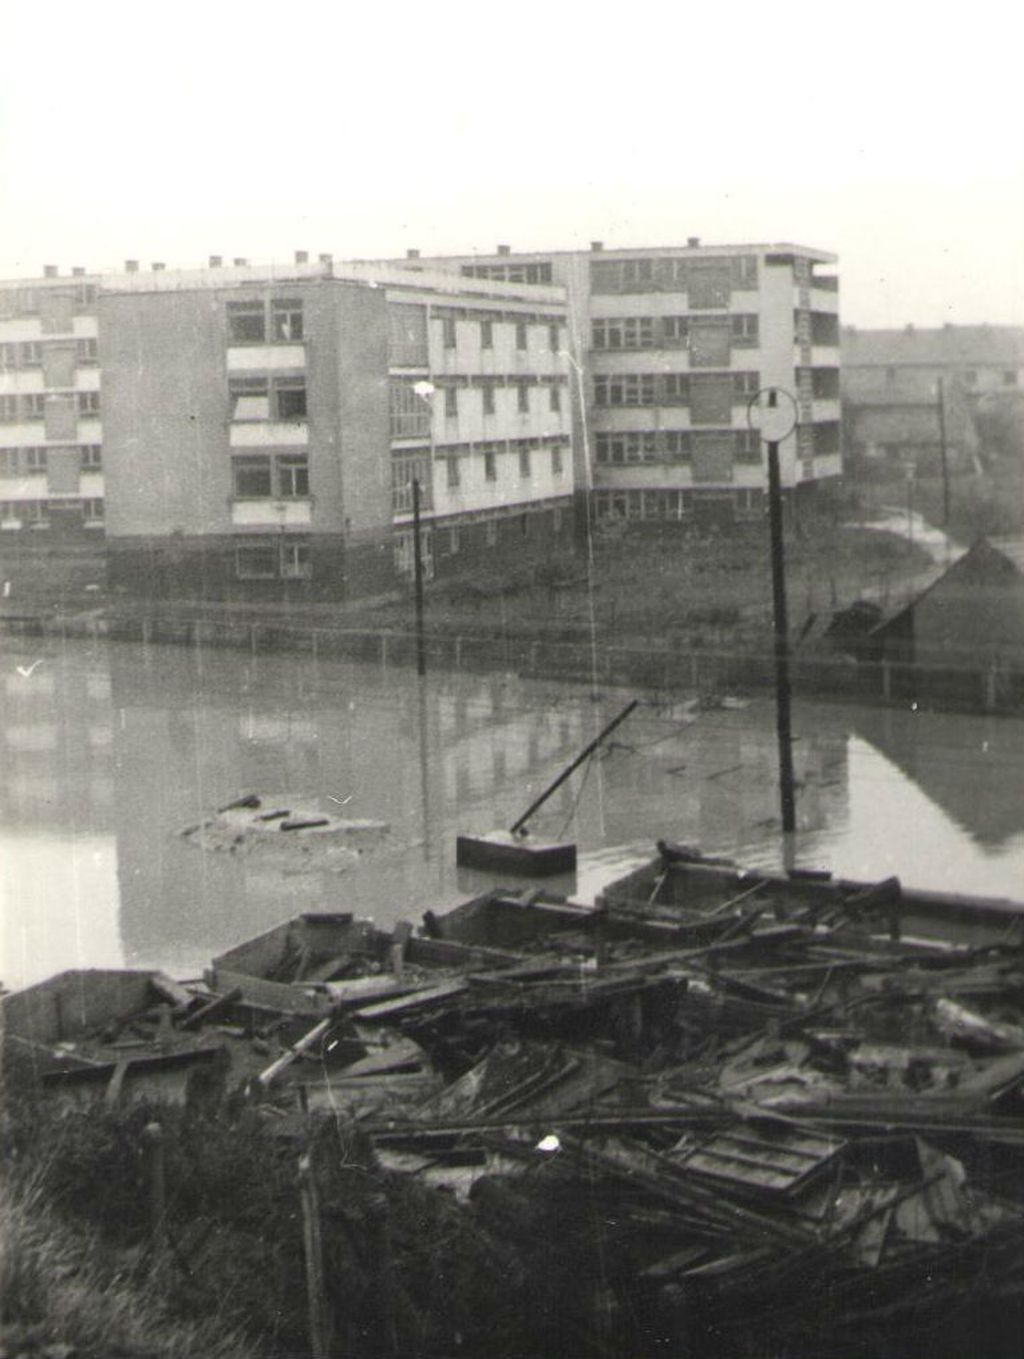 Po ulicama se preljevalo pola metra do jedan metar vode